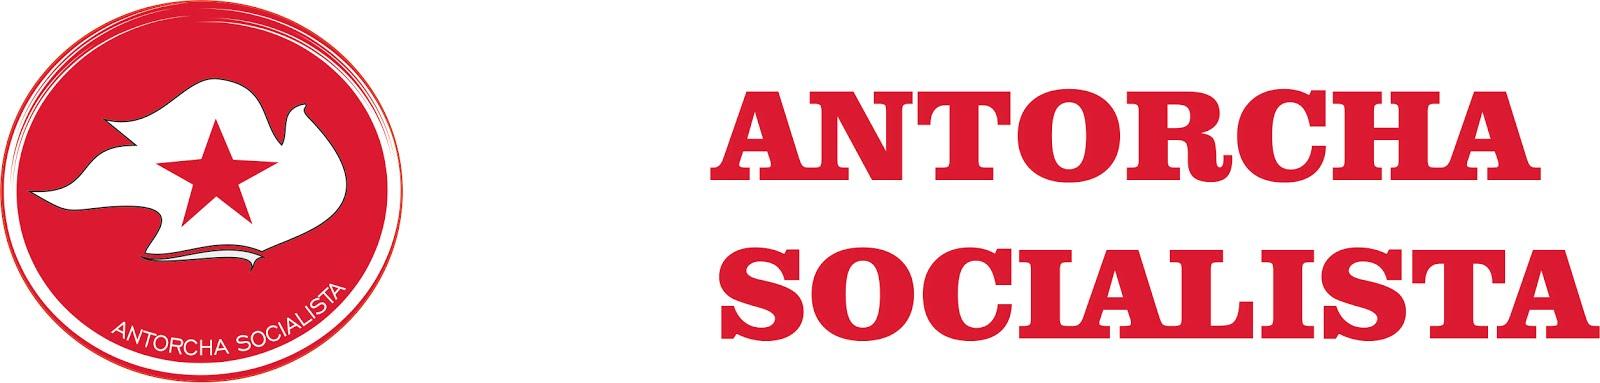 Antorcha Socialista